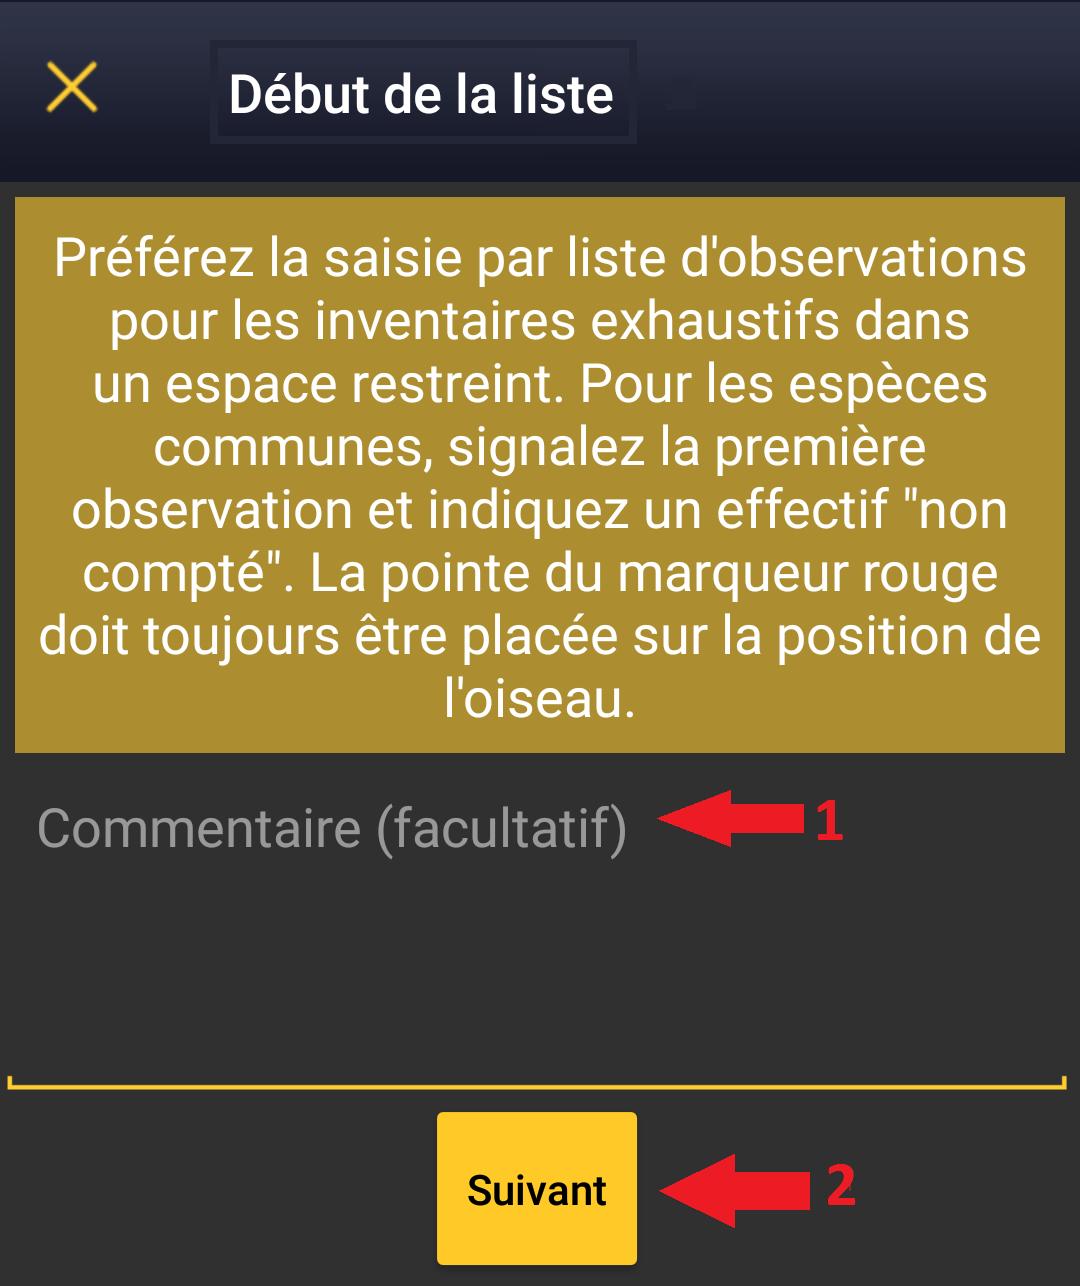 https://cdnfiles1.biolovision.net/www.faune-france.org/userfiles/ListeNaturaList/2-editez-liste.png